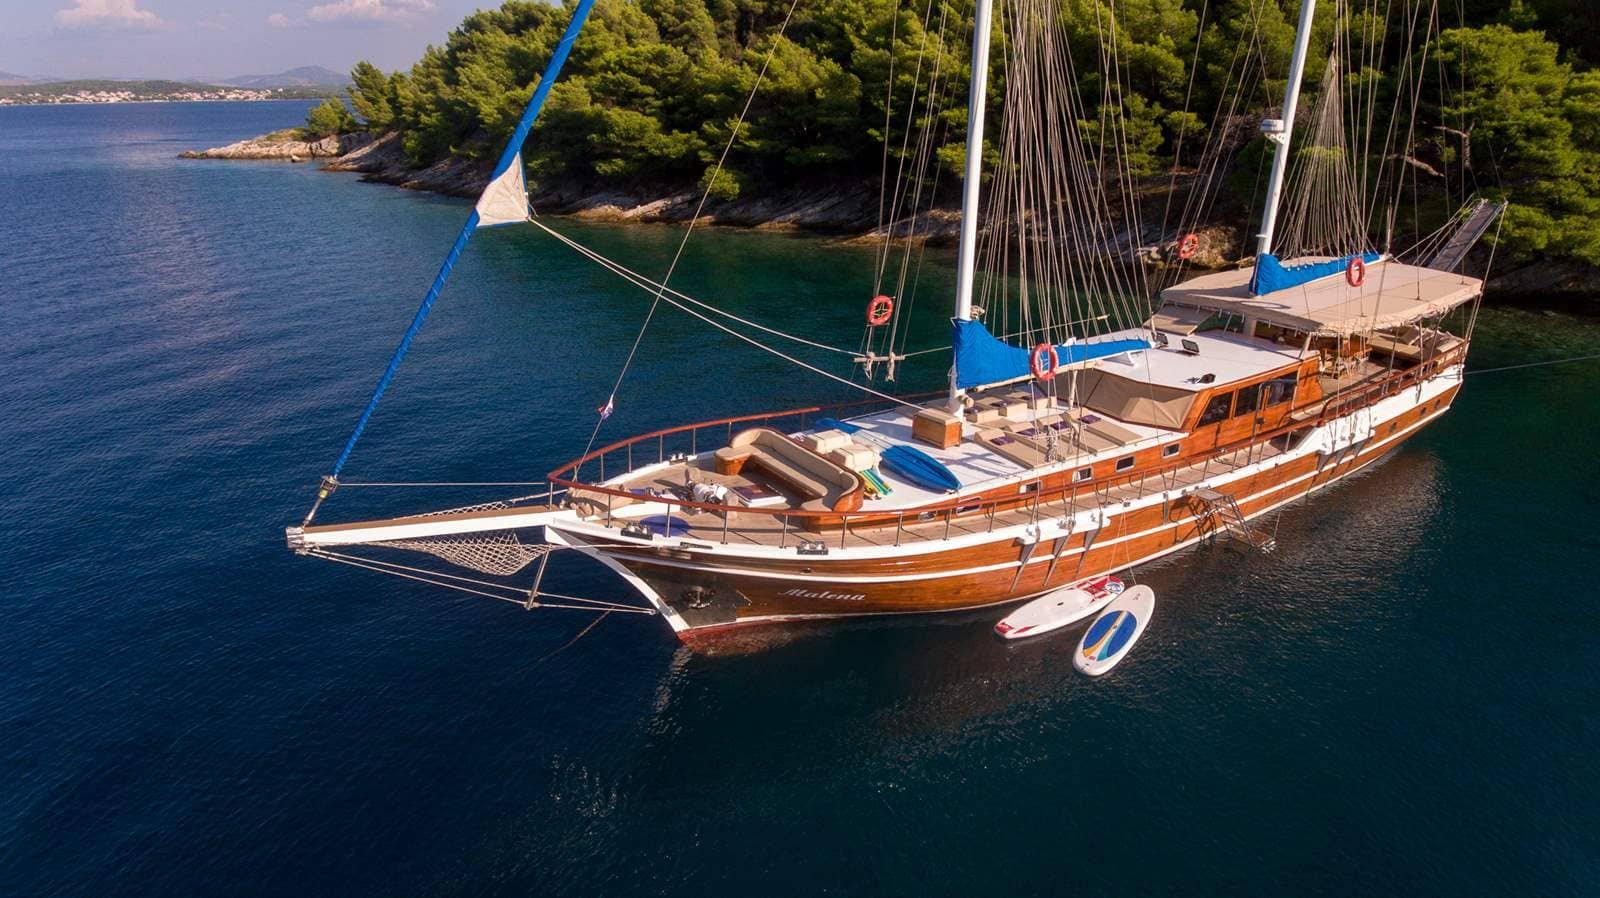 Aerial view of a wooden gulet ship anchored near an island